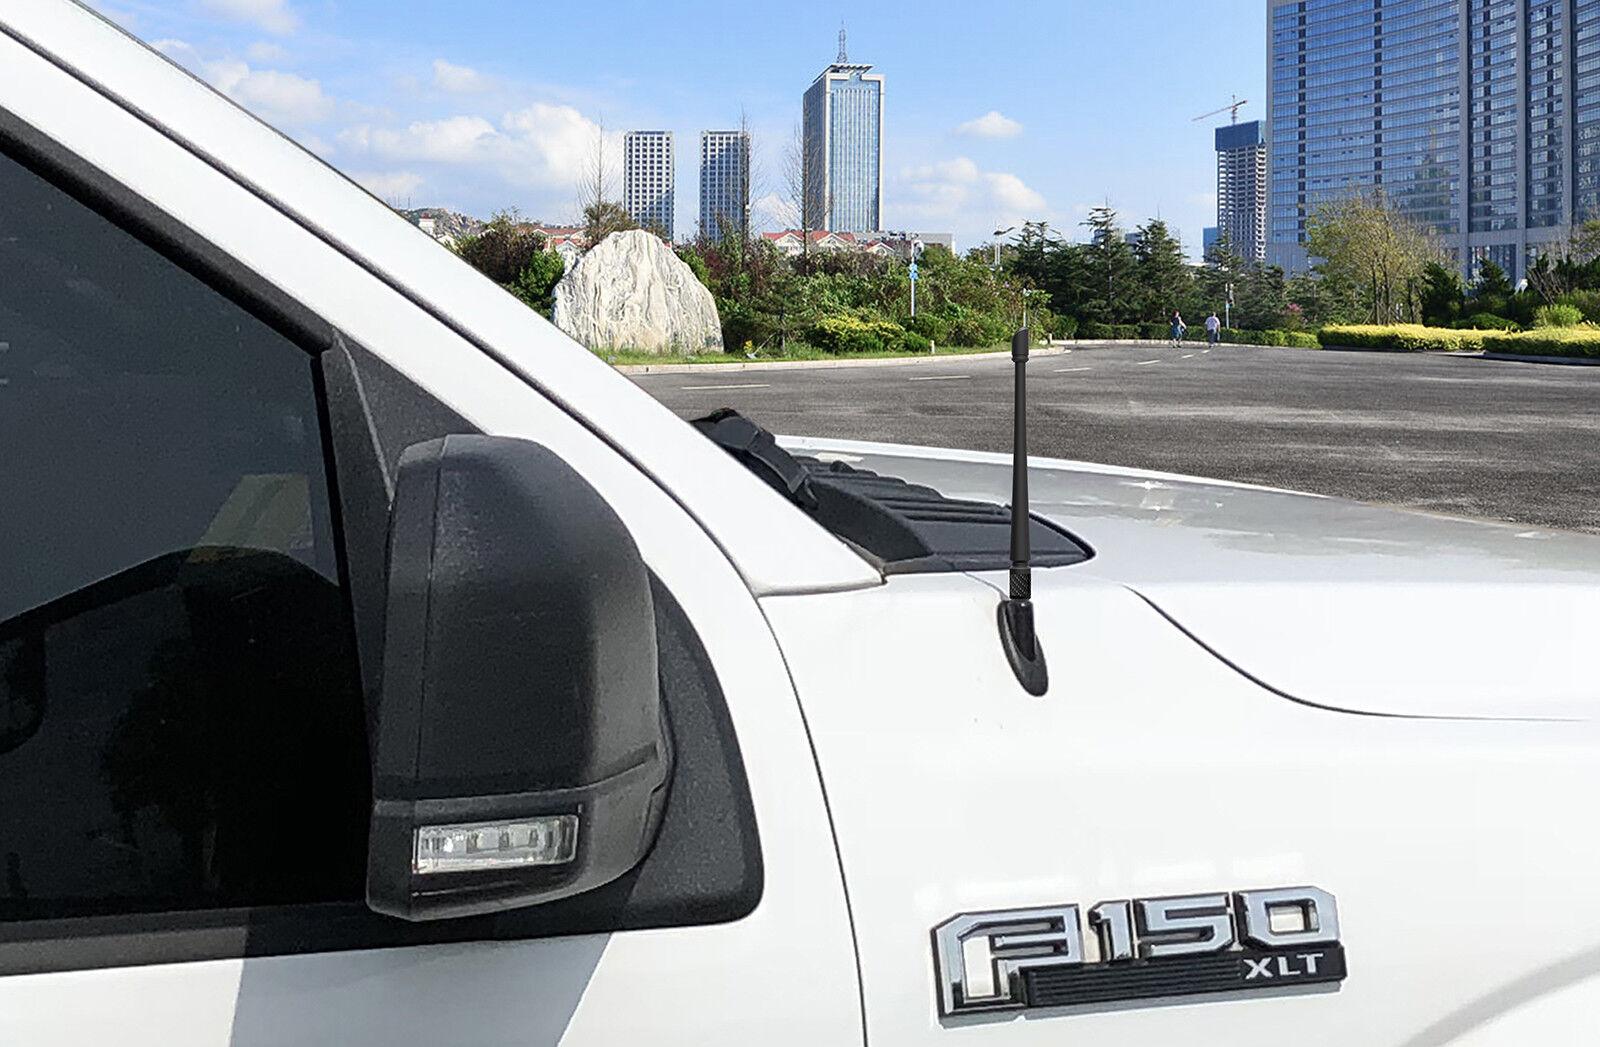 "как выглядит Rydonair 7"" Short Antenna Replacement with Ford F150 Raptor 2009-2021 фото"